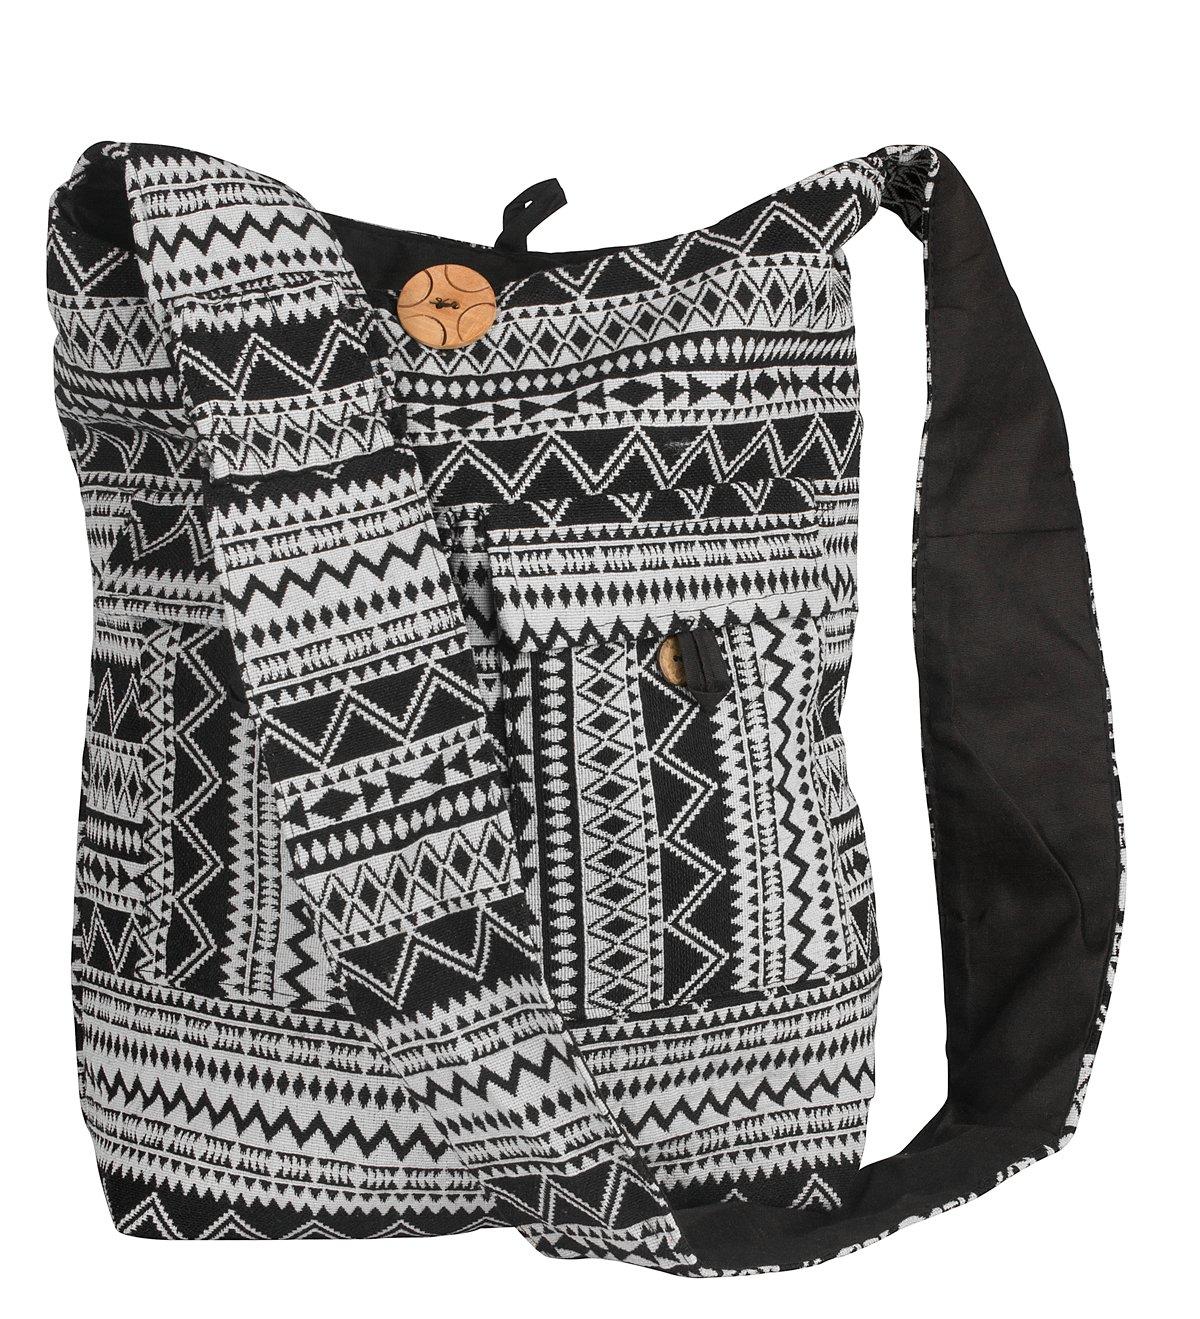 Tribe Azure Large Hobo Crossbody Sling Shoulder Bag Compartment Pockets Functional Zipper Travel Market Books Blanket (Black White)